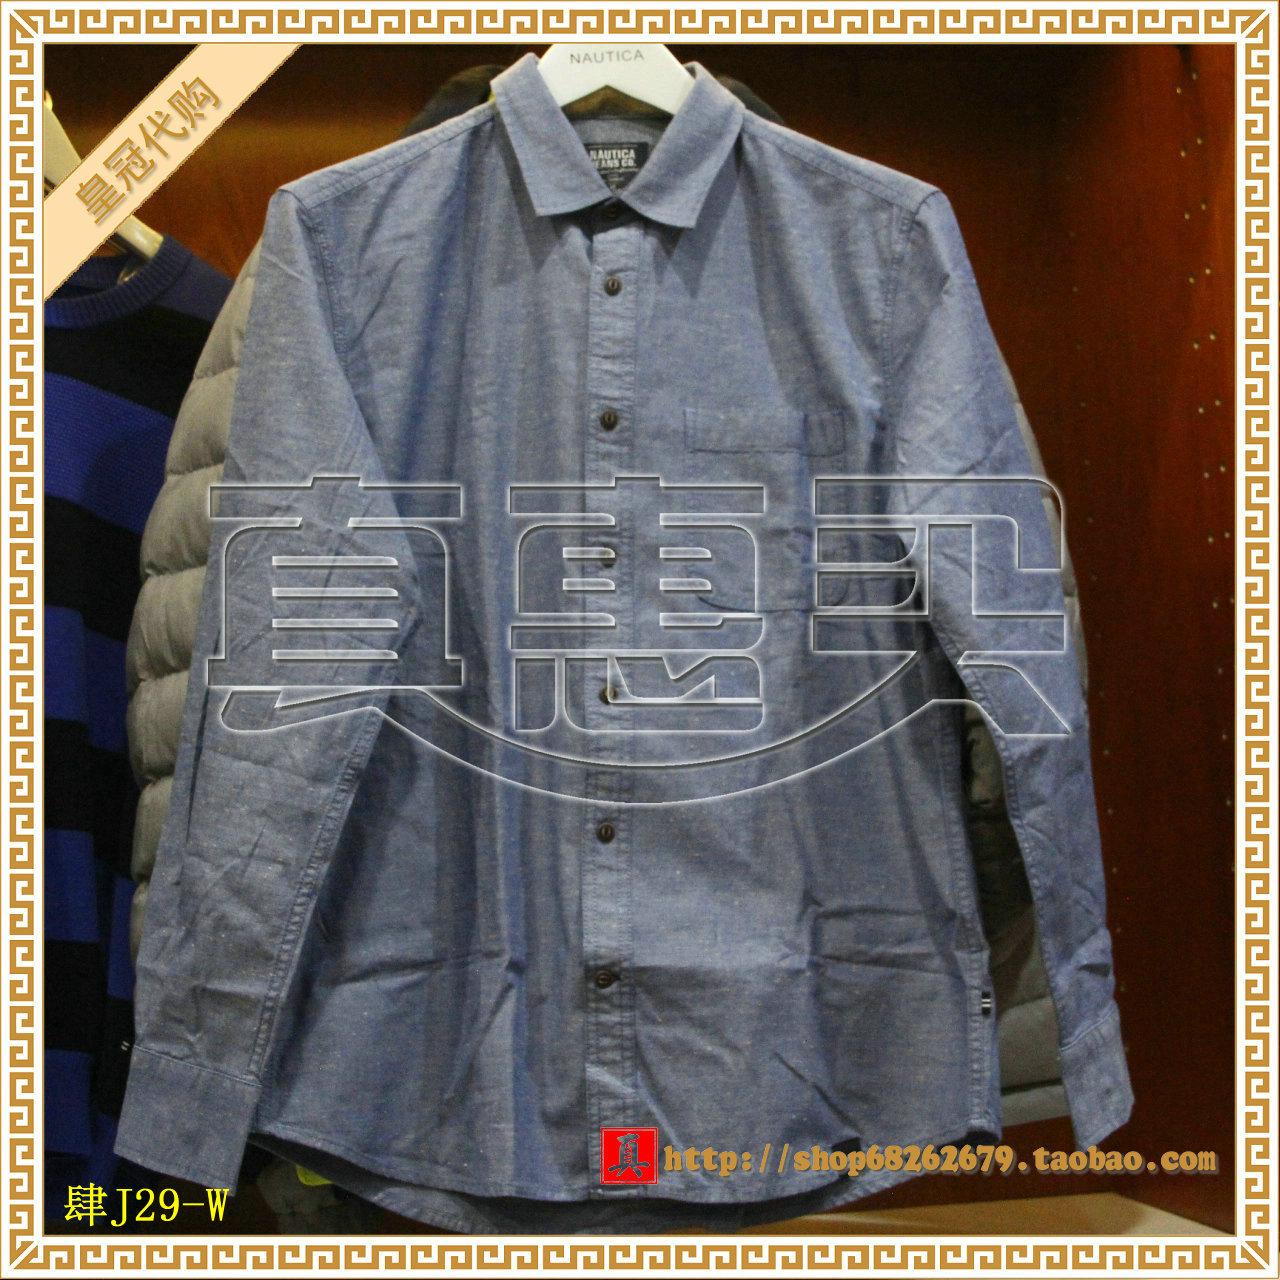 Рубашка мужская Nautica  14 1290 4W4902N-4RM толстовка nautica 2k 1200 n autica